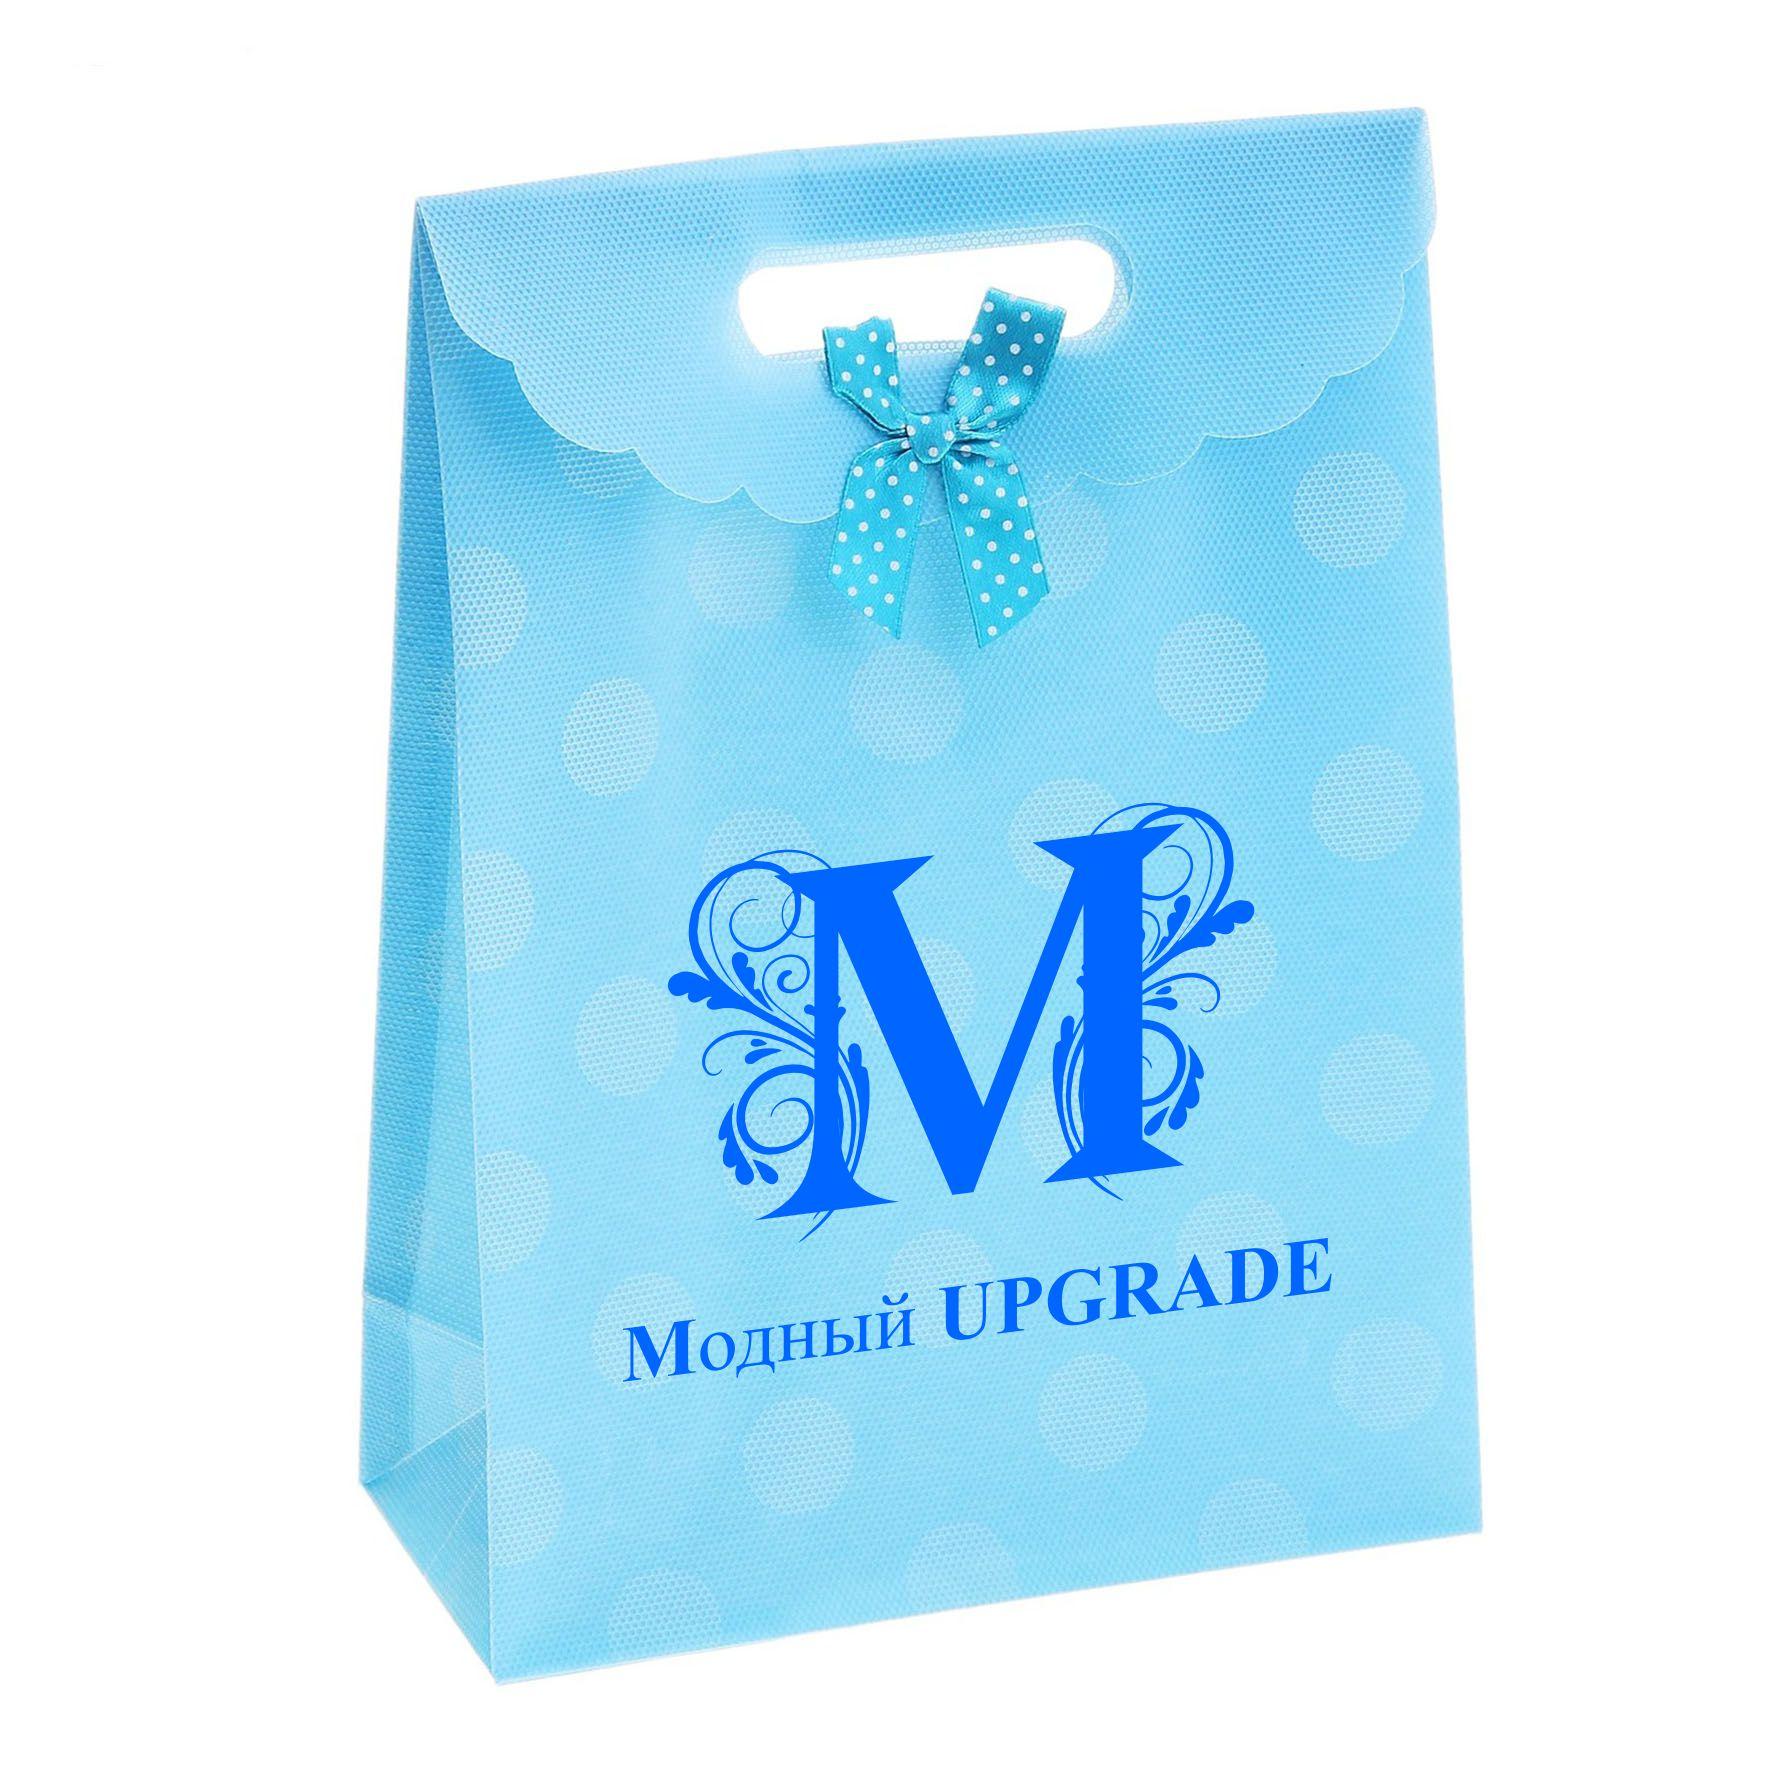 "Логотип интернет магазина ""Модный UPGRADE"" фото f_43759418b20bb53b.jpg"